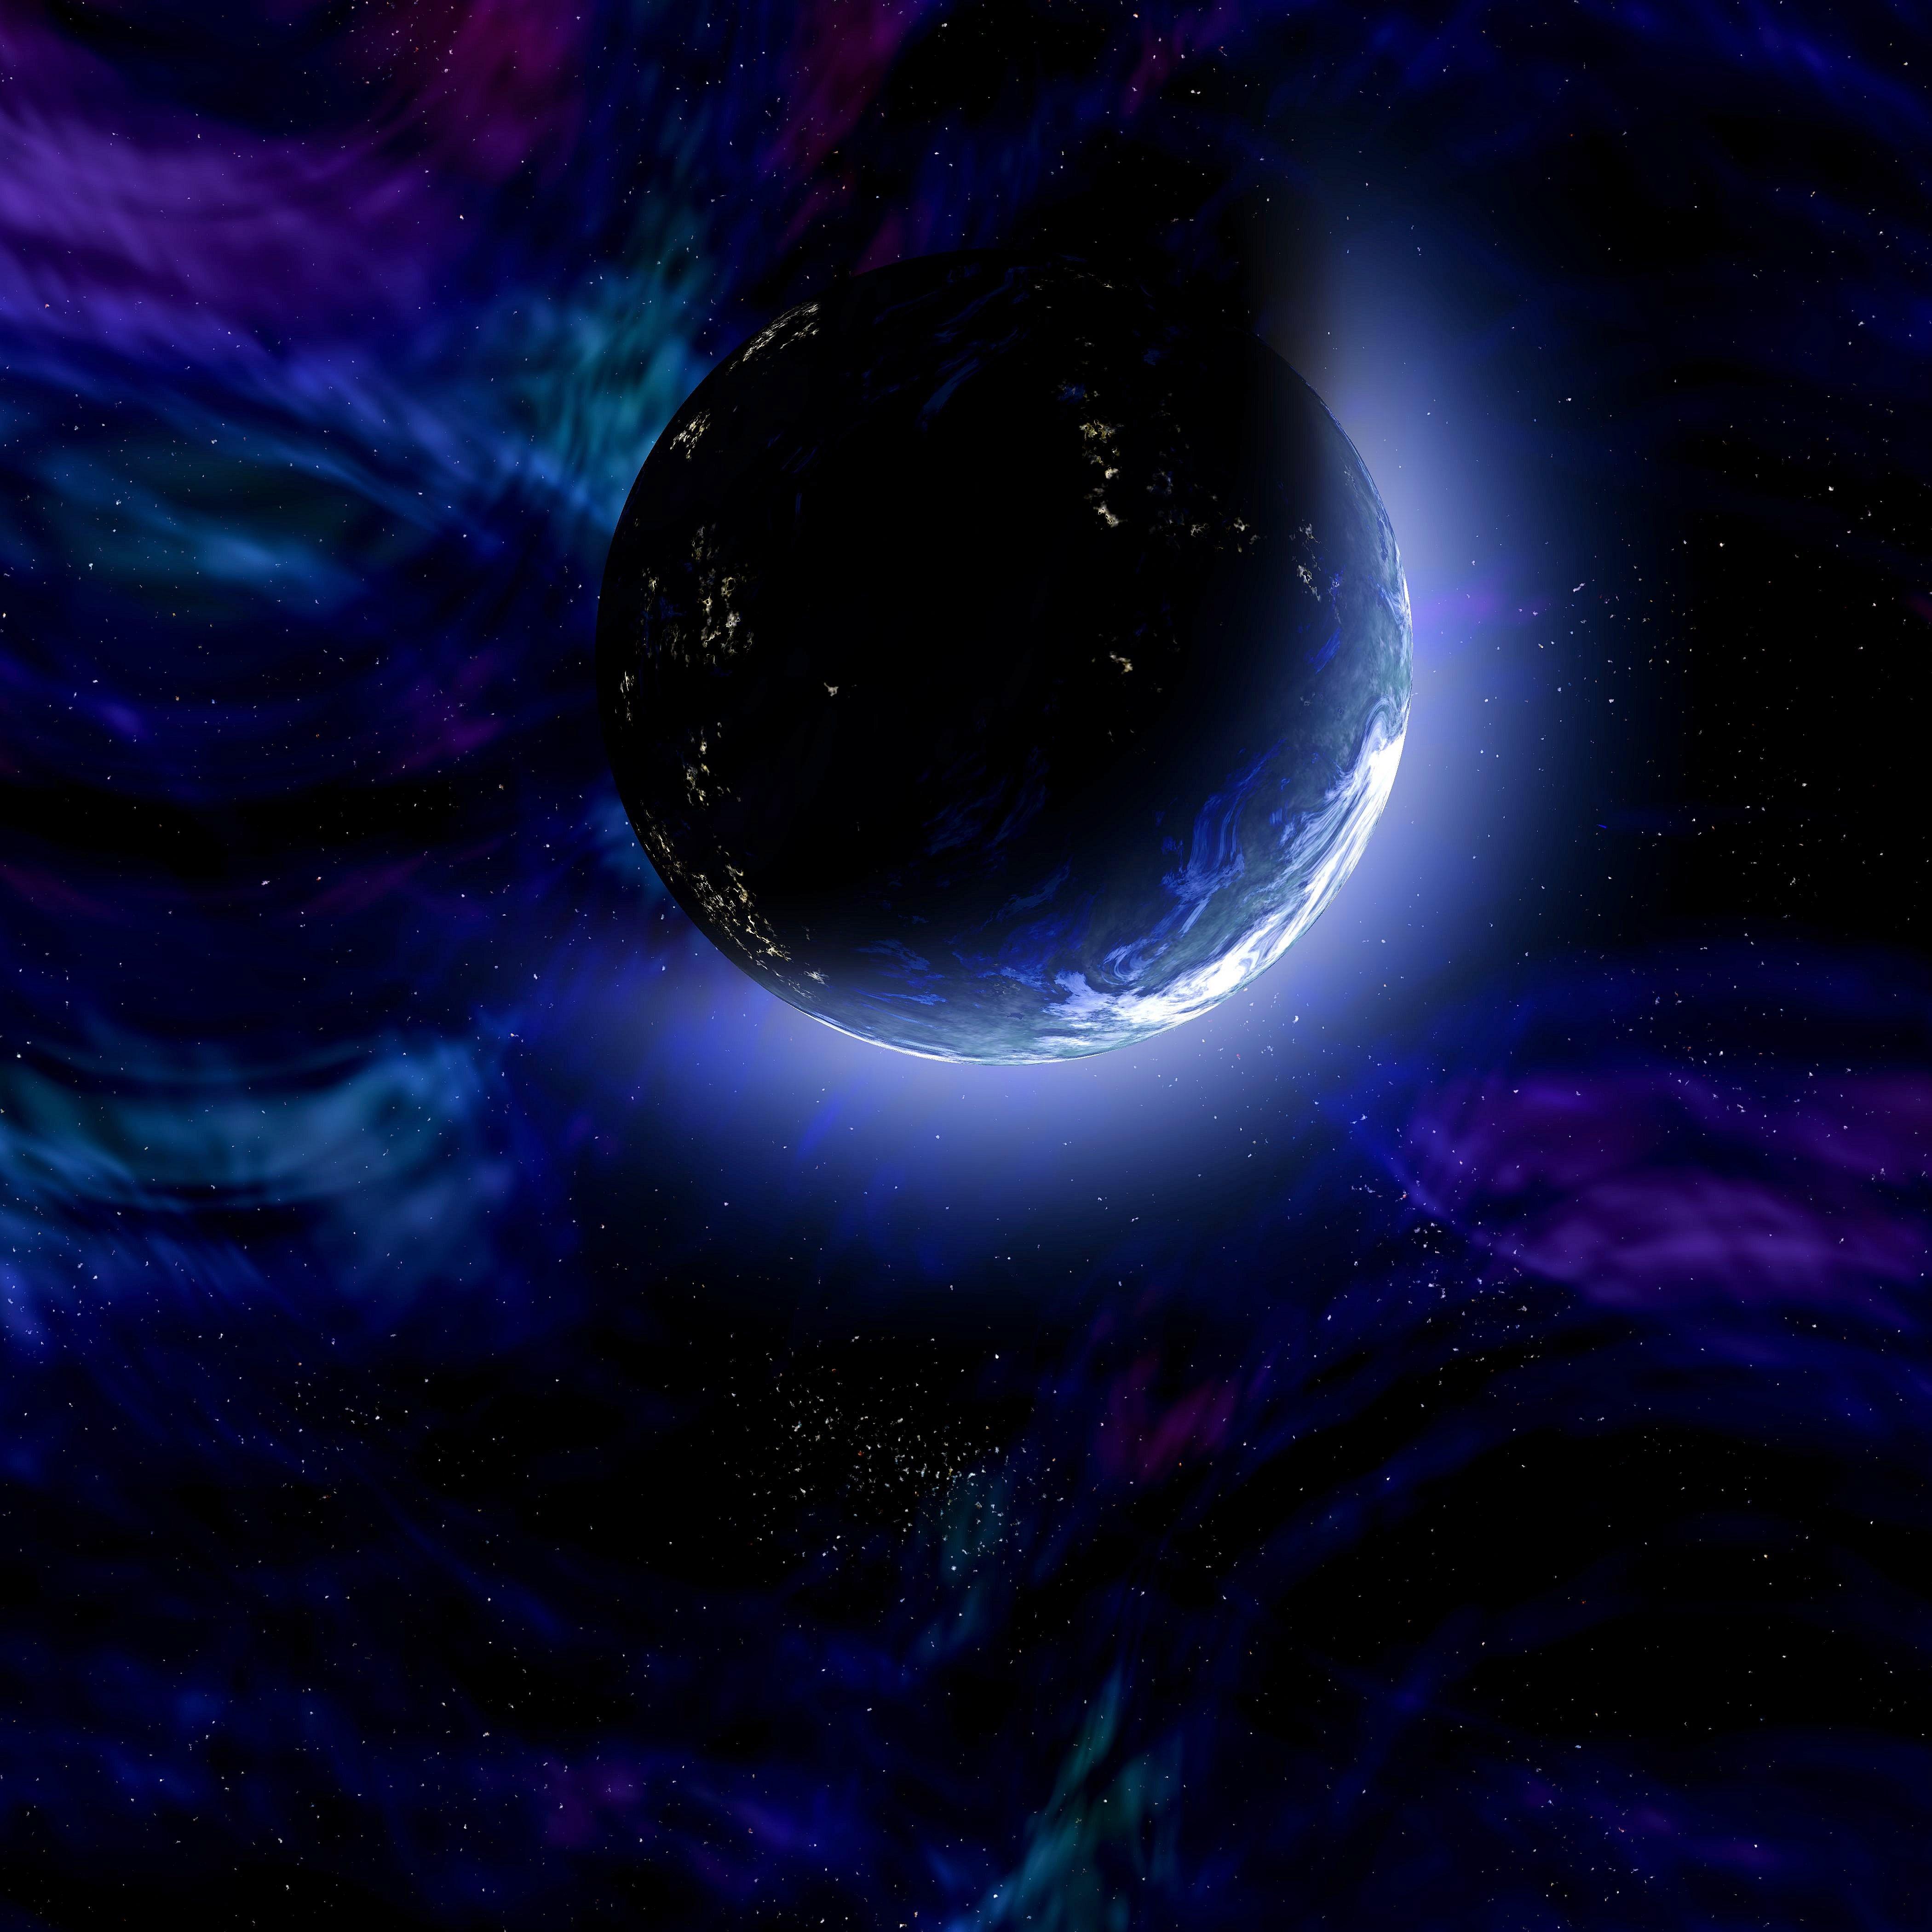 planet-1597025